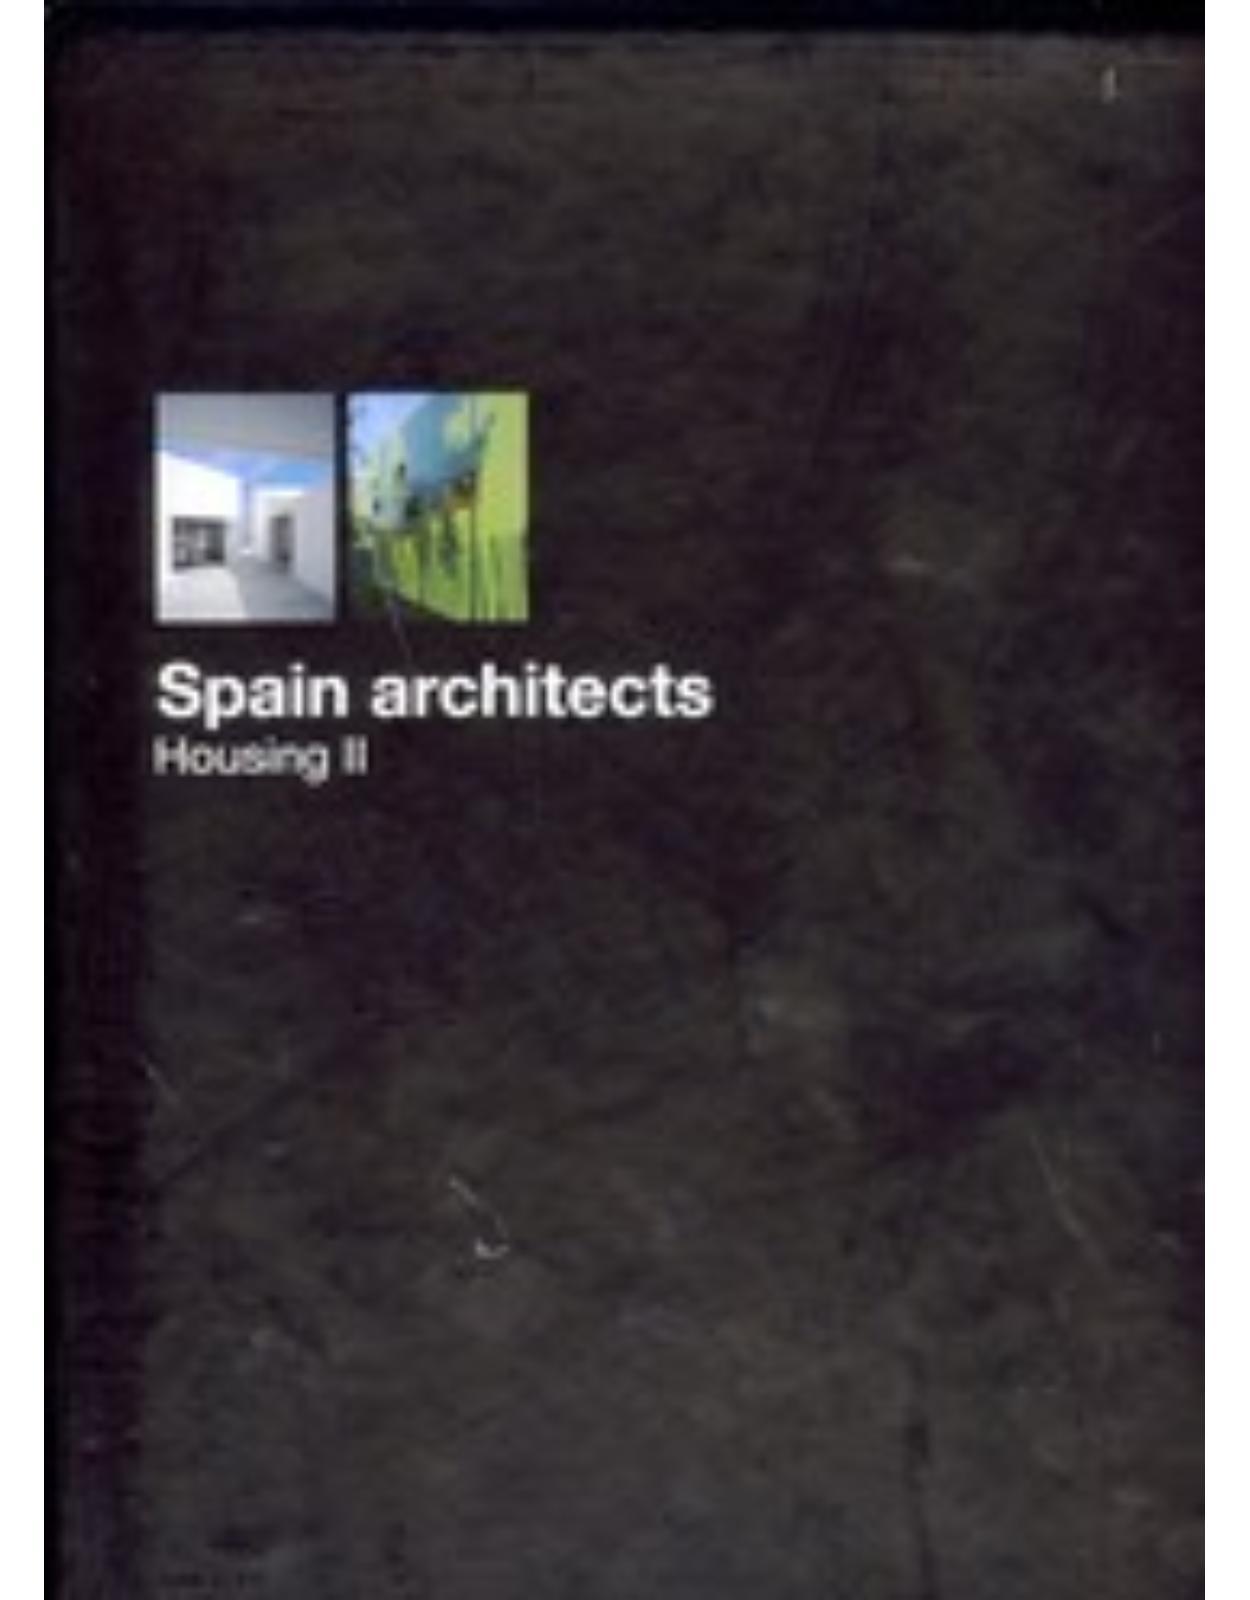 Spain Architects - Housing II